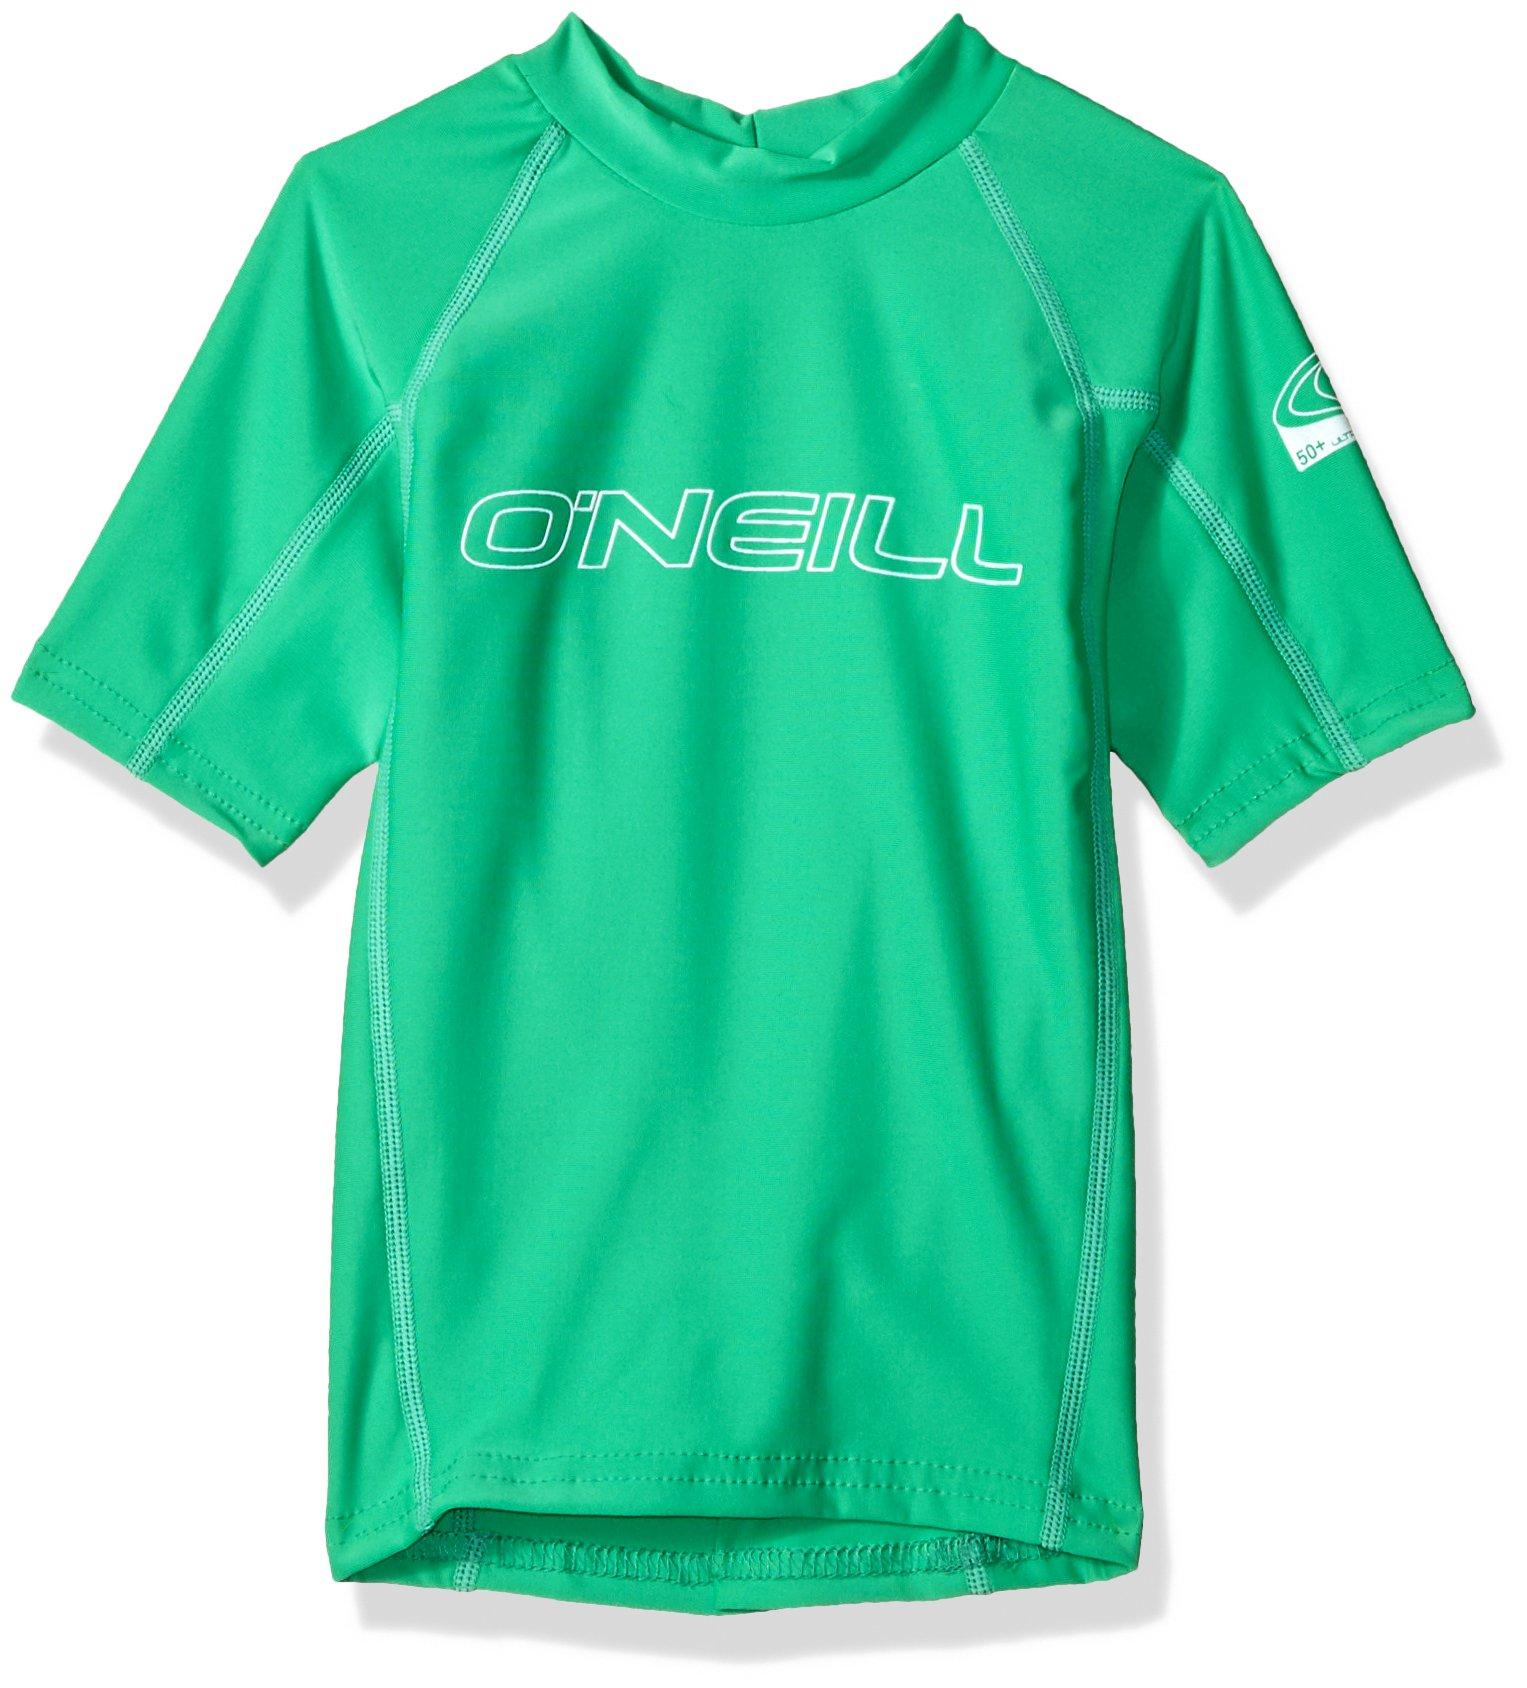 O'Neill Wetsuits UV Sun Protection Youth Basic Skins Short Sleeve Crew Sun Shirt Rash Guard, Sea Glass, 12